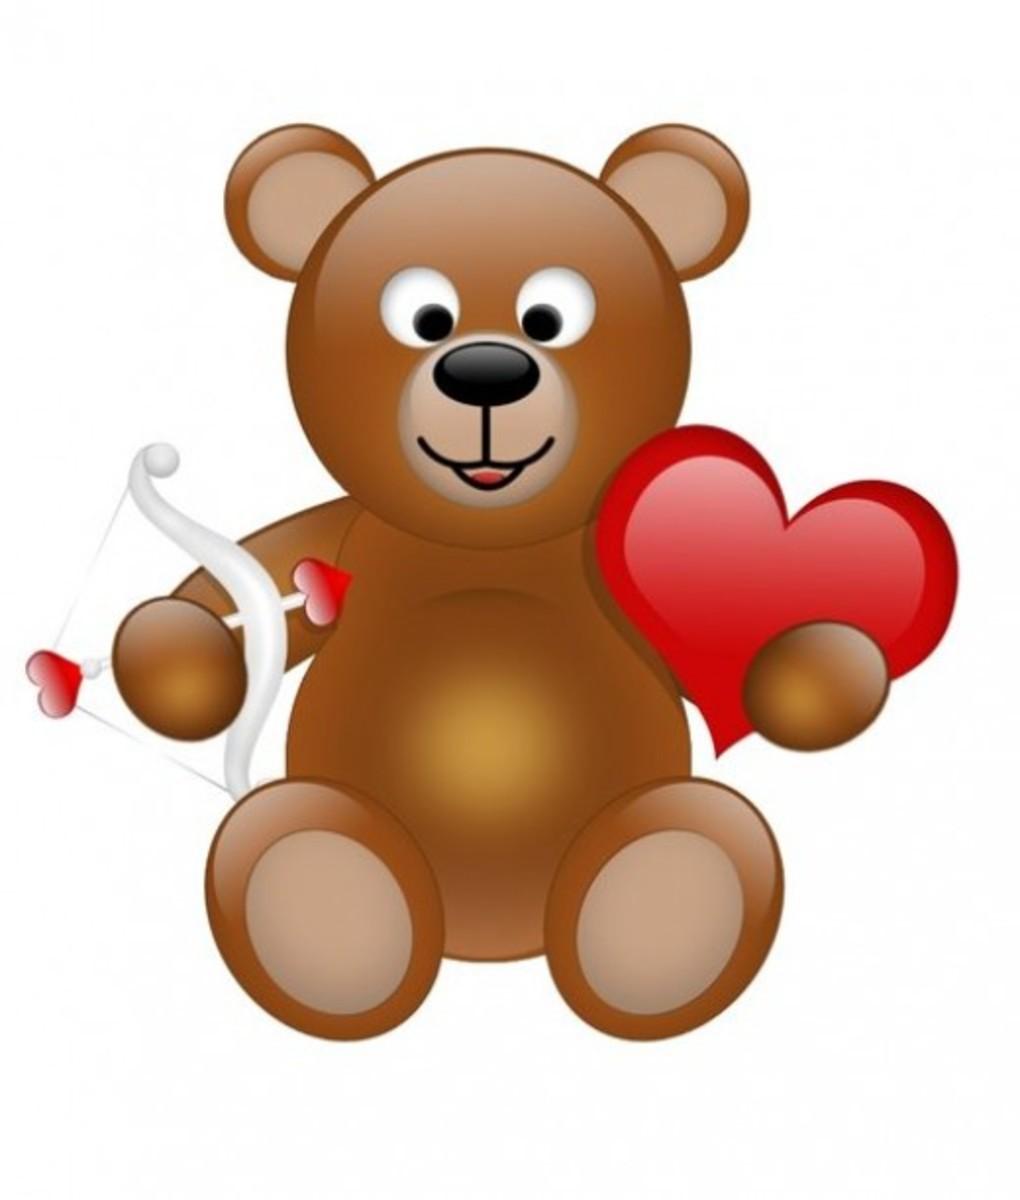 Teddy Bear with Cupid's Bow and Heart